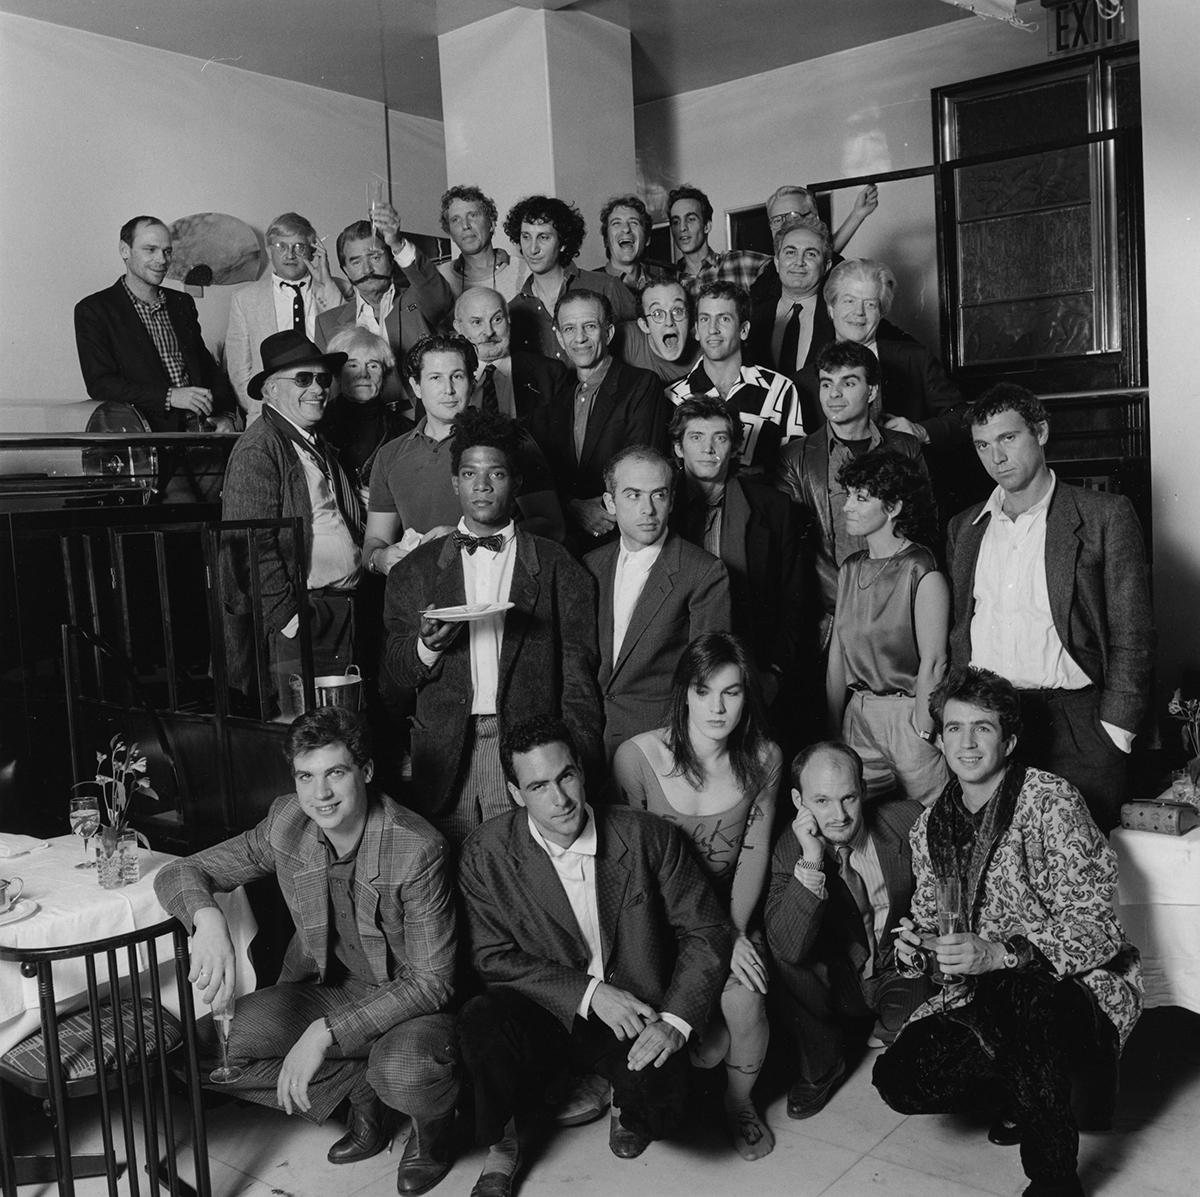 WARHOL 20TH CENTURY ARTISTS